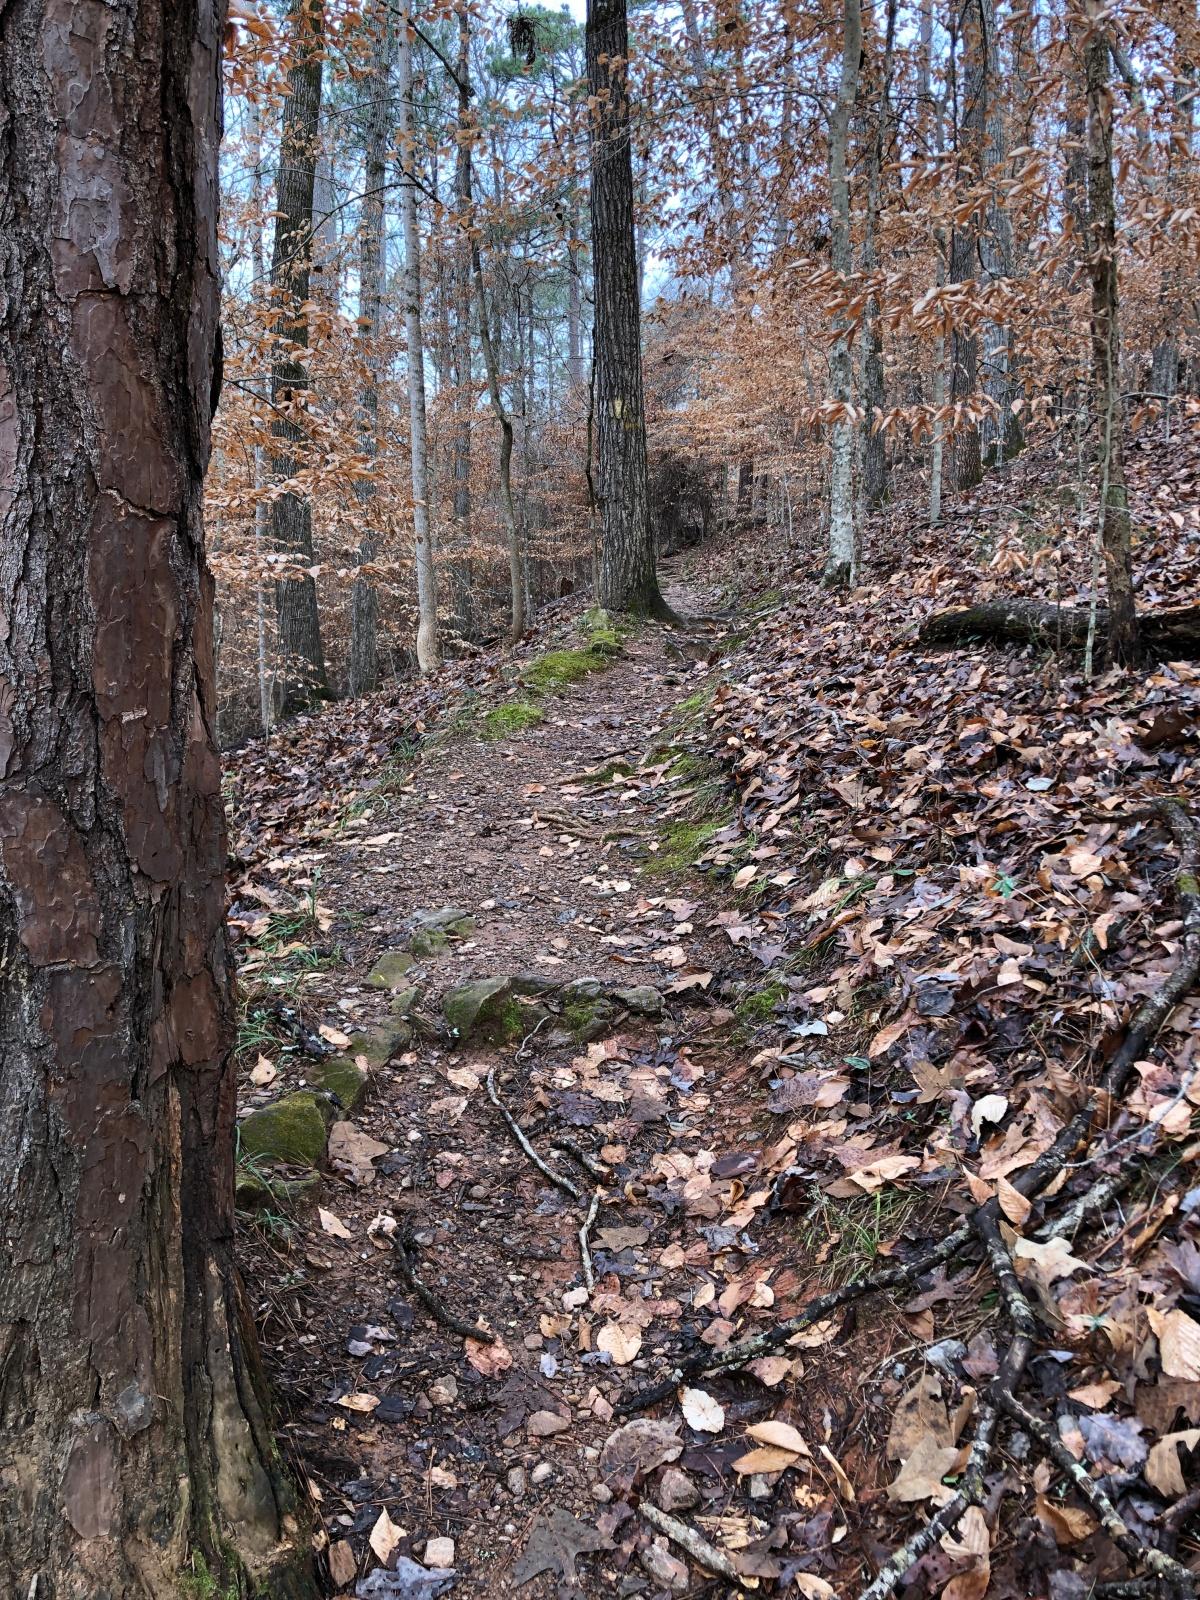 Hiking trail at Indian Springs State Park, GA